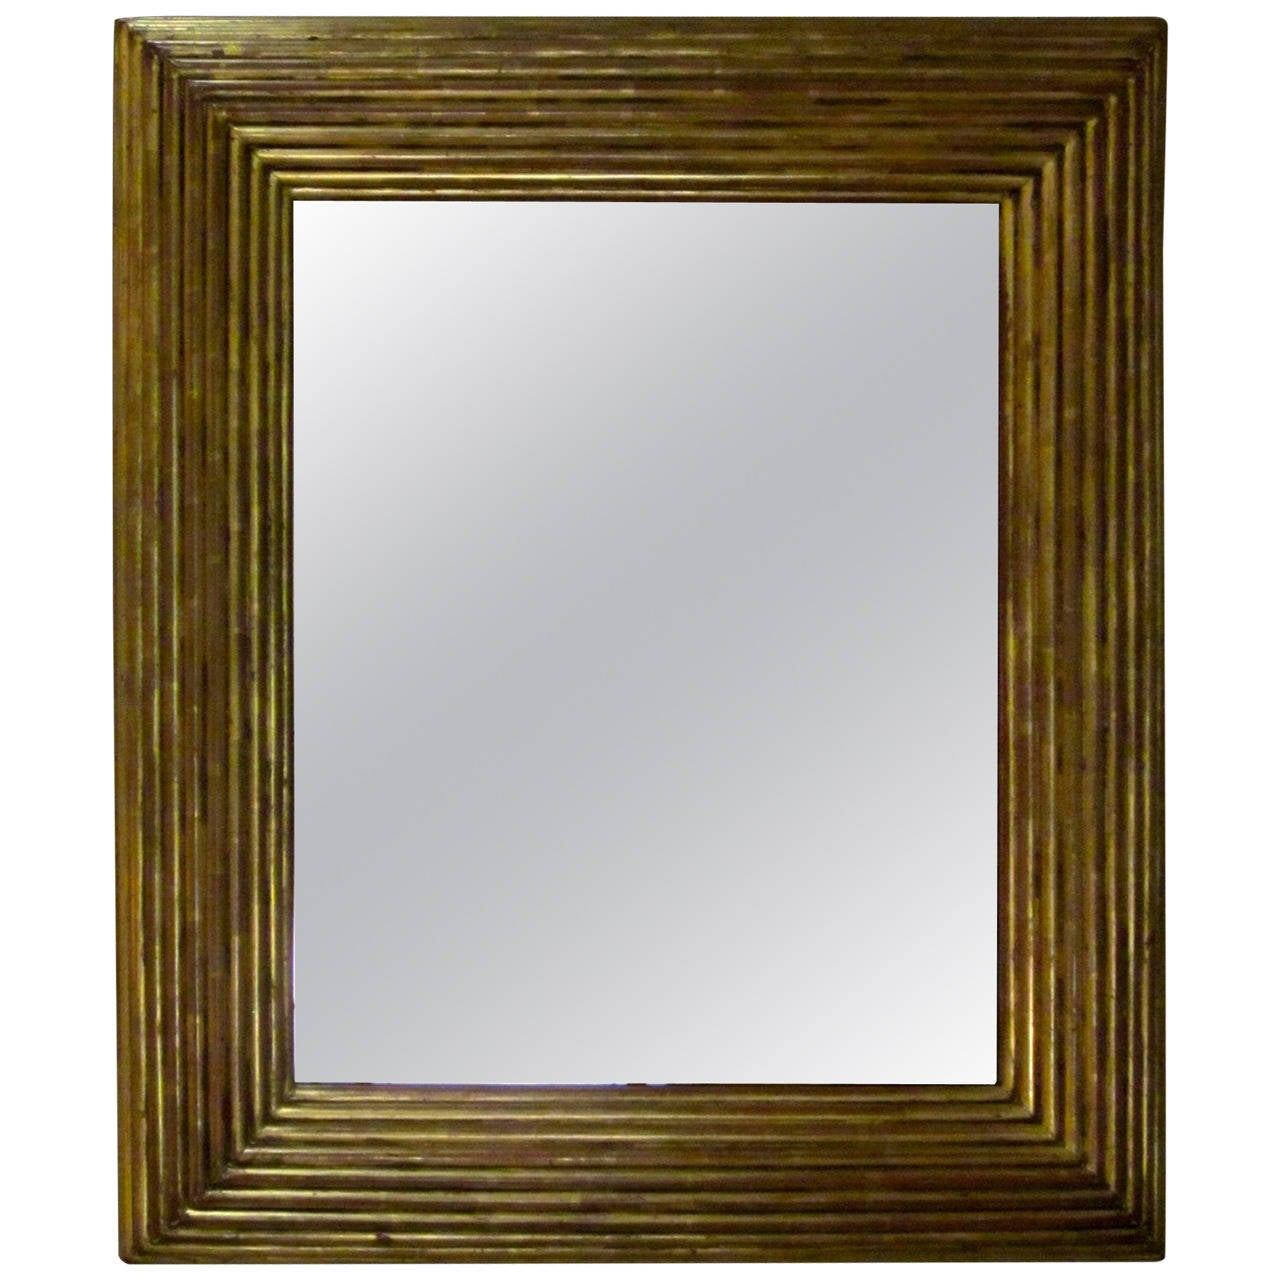 Relaxing Spanish G Gilt Ribbed Wood Frame Circa Century Spanish Mirror Selfie Mirror Lyrics Spanish Sale Spanish G Gilt Ribbed Wood Frame Circa Century houzz-02 Mirror In Spanish